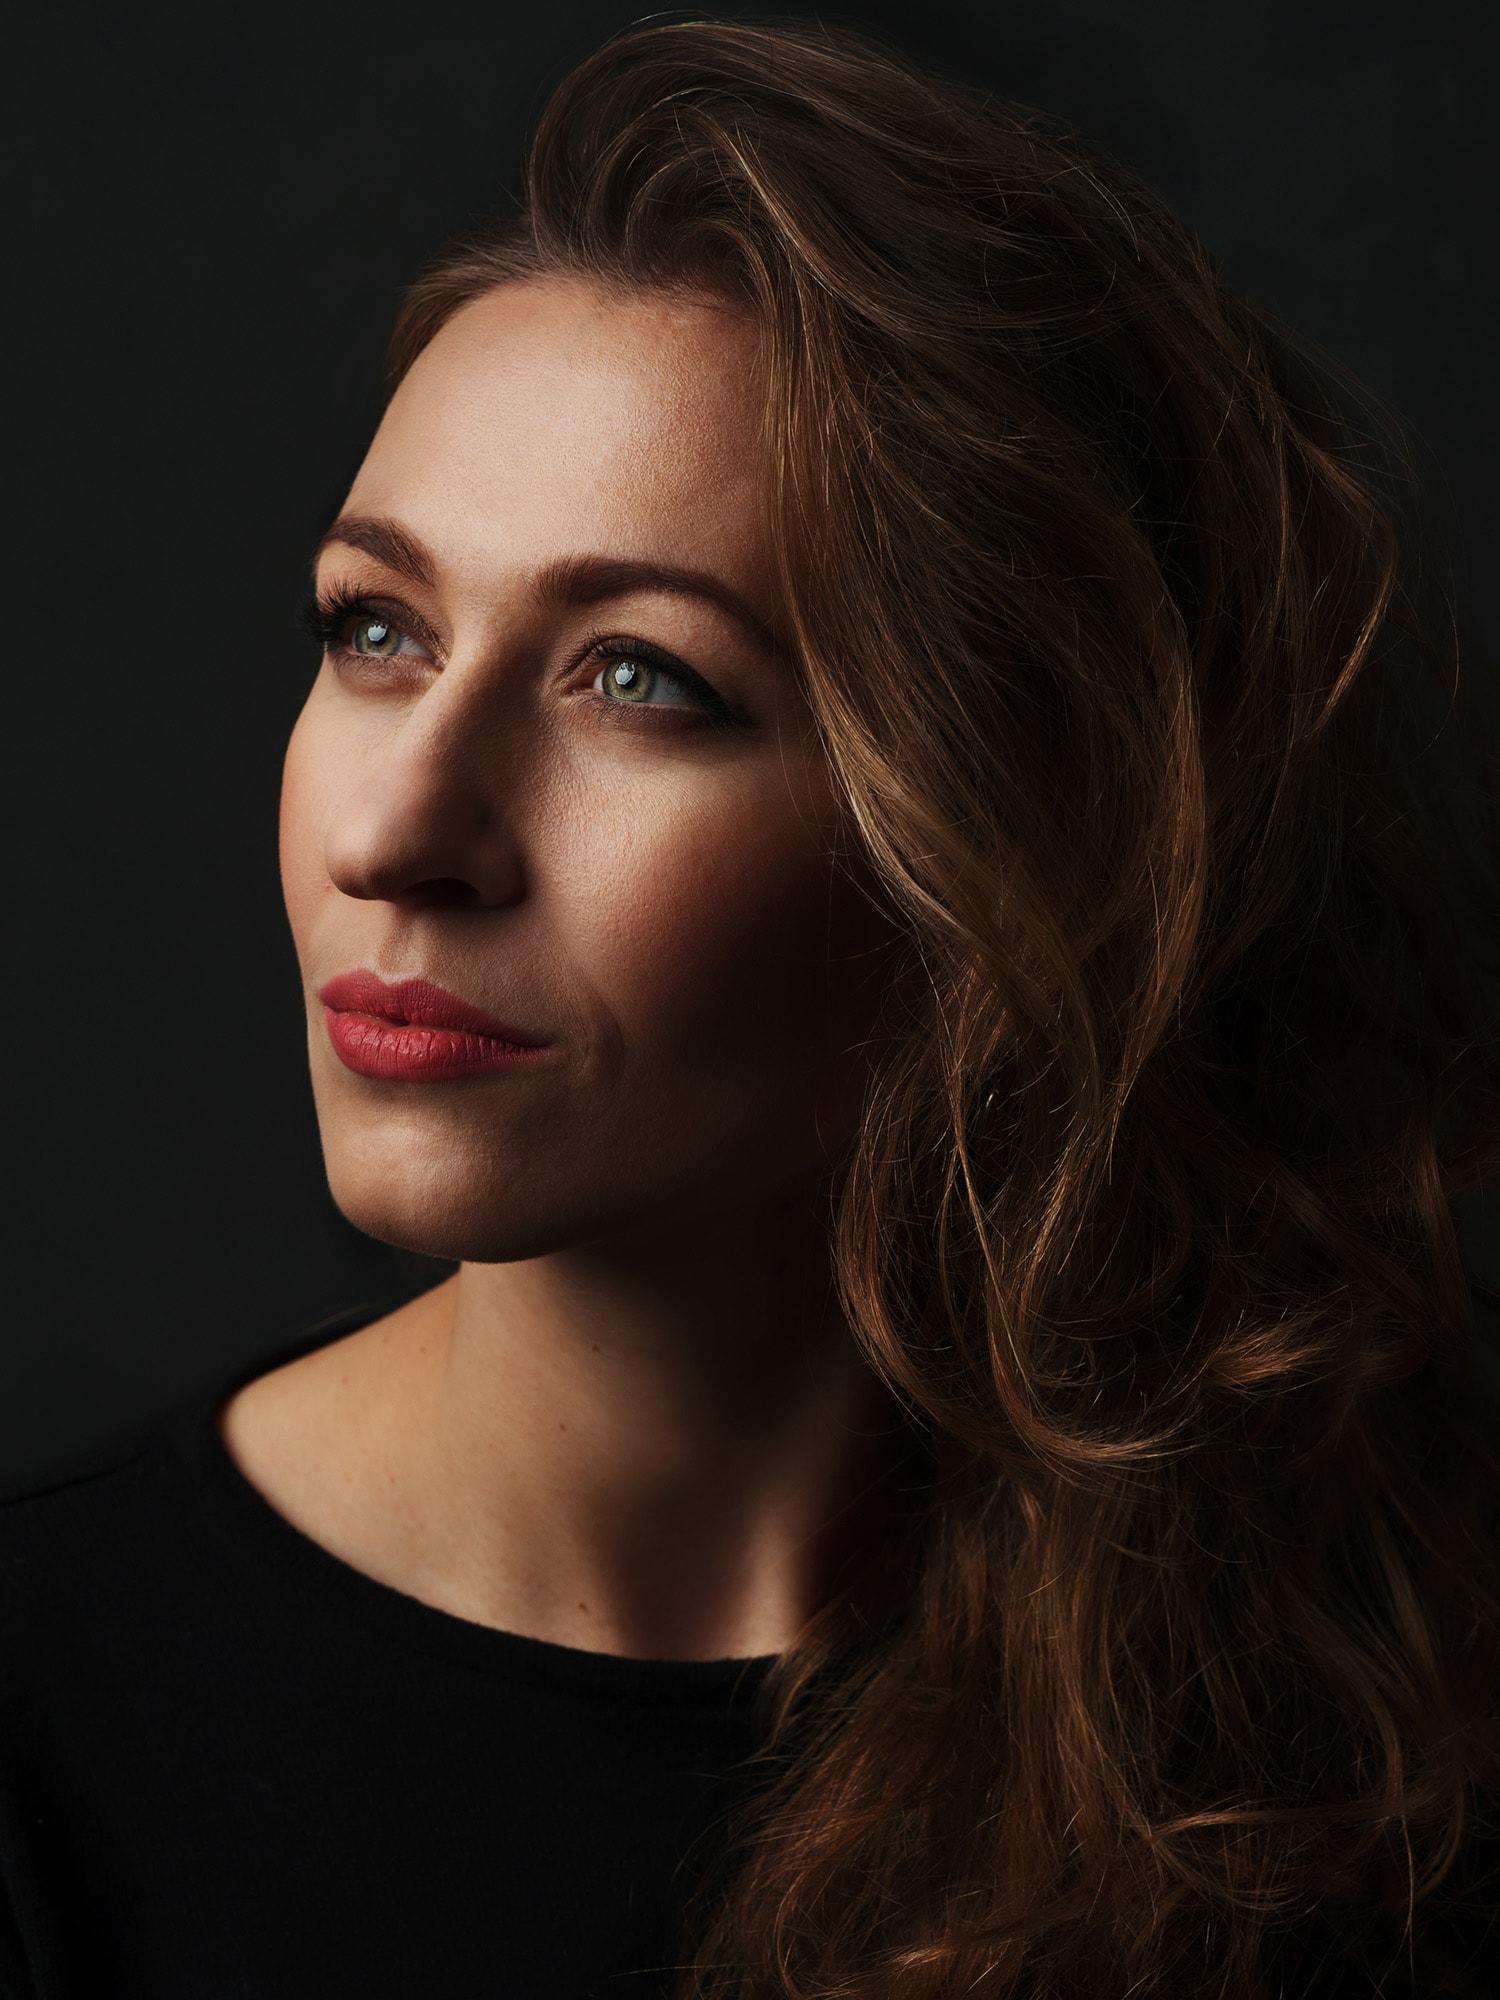 Sesja portretowa Doroty